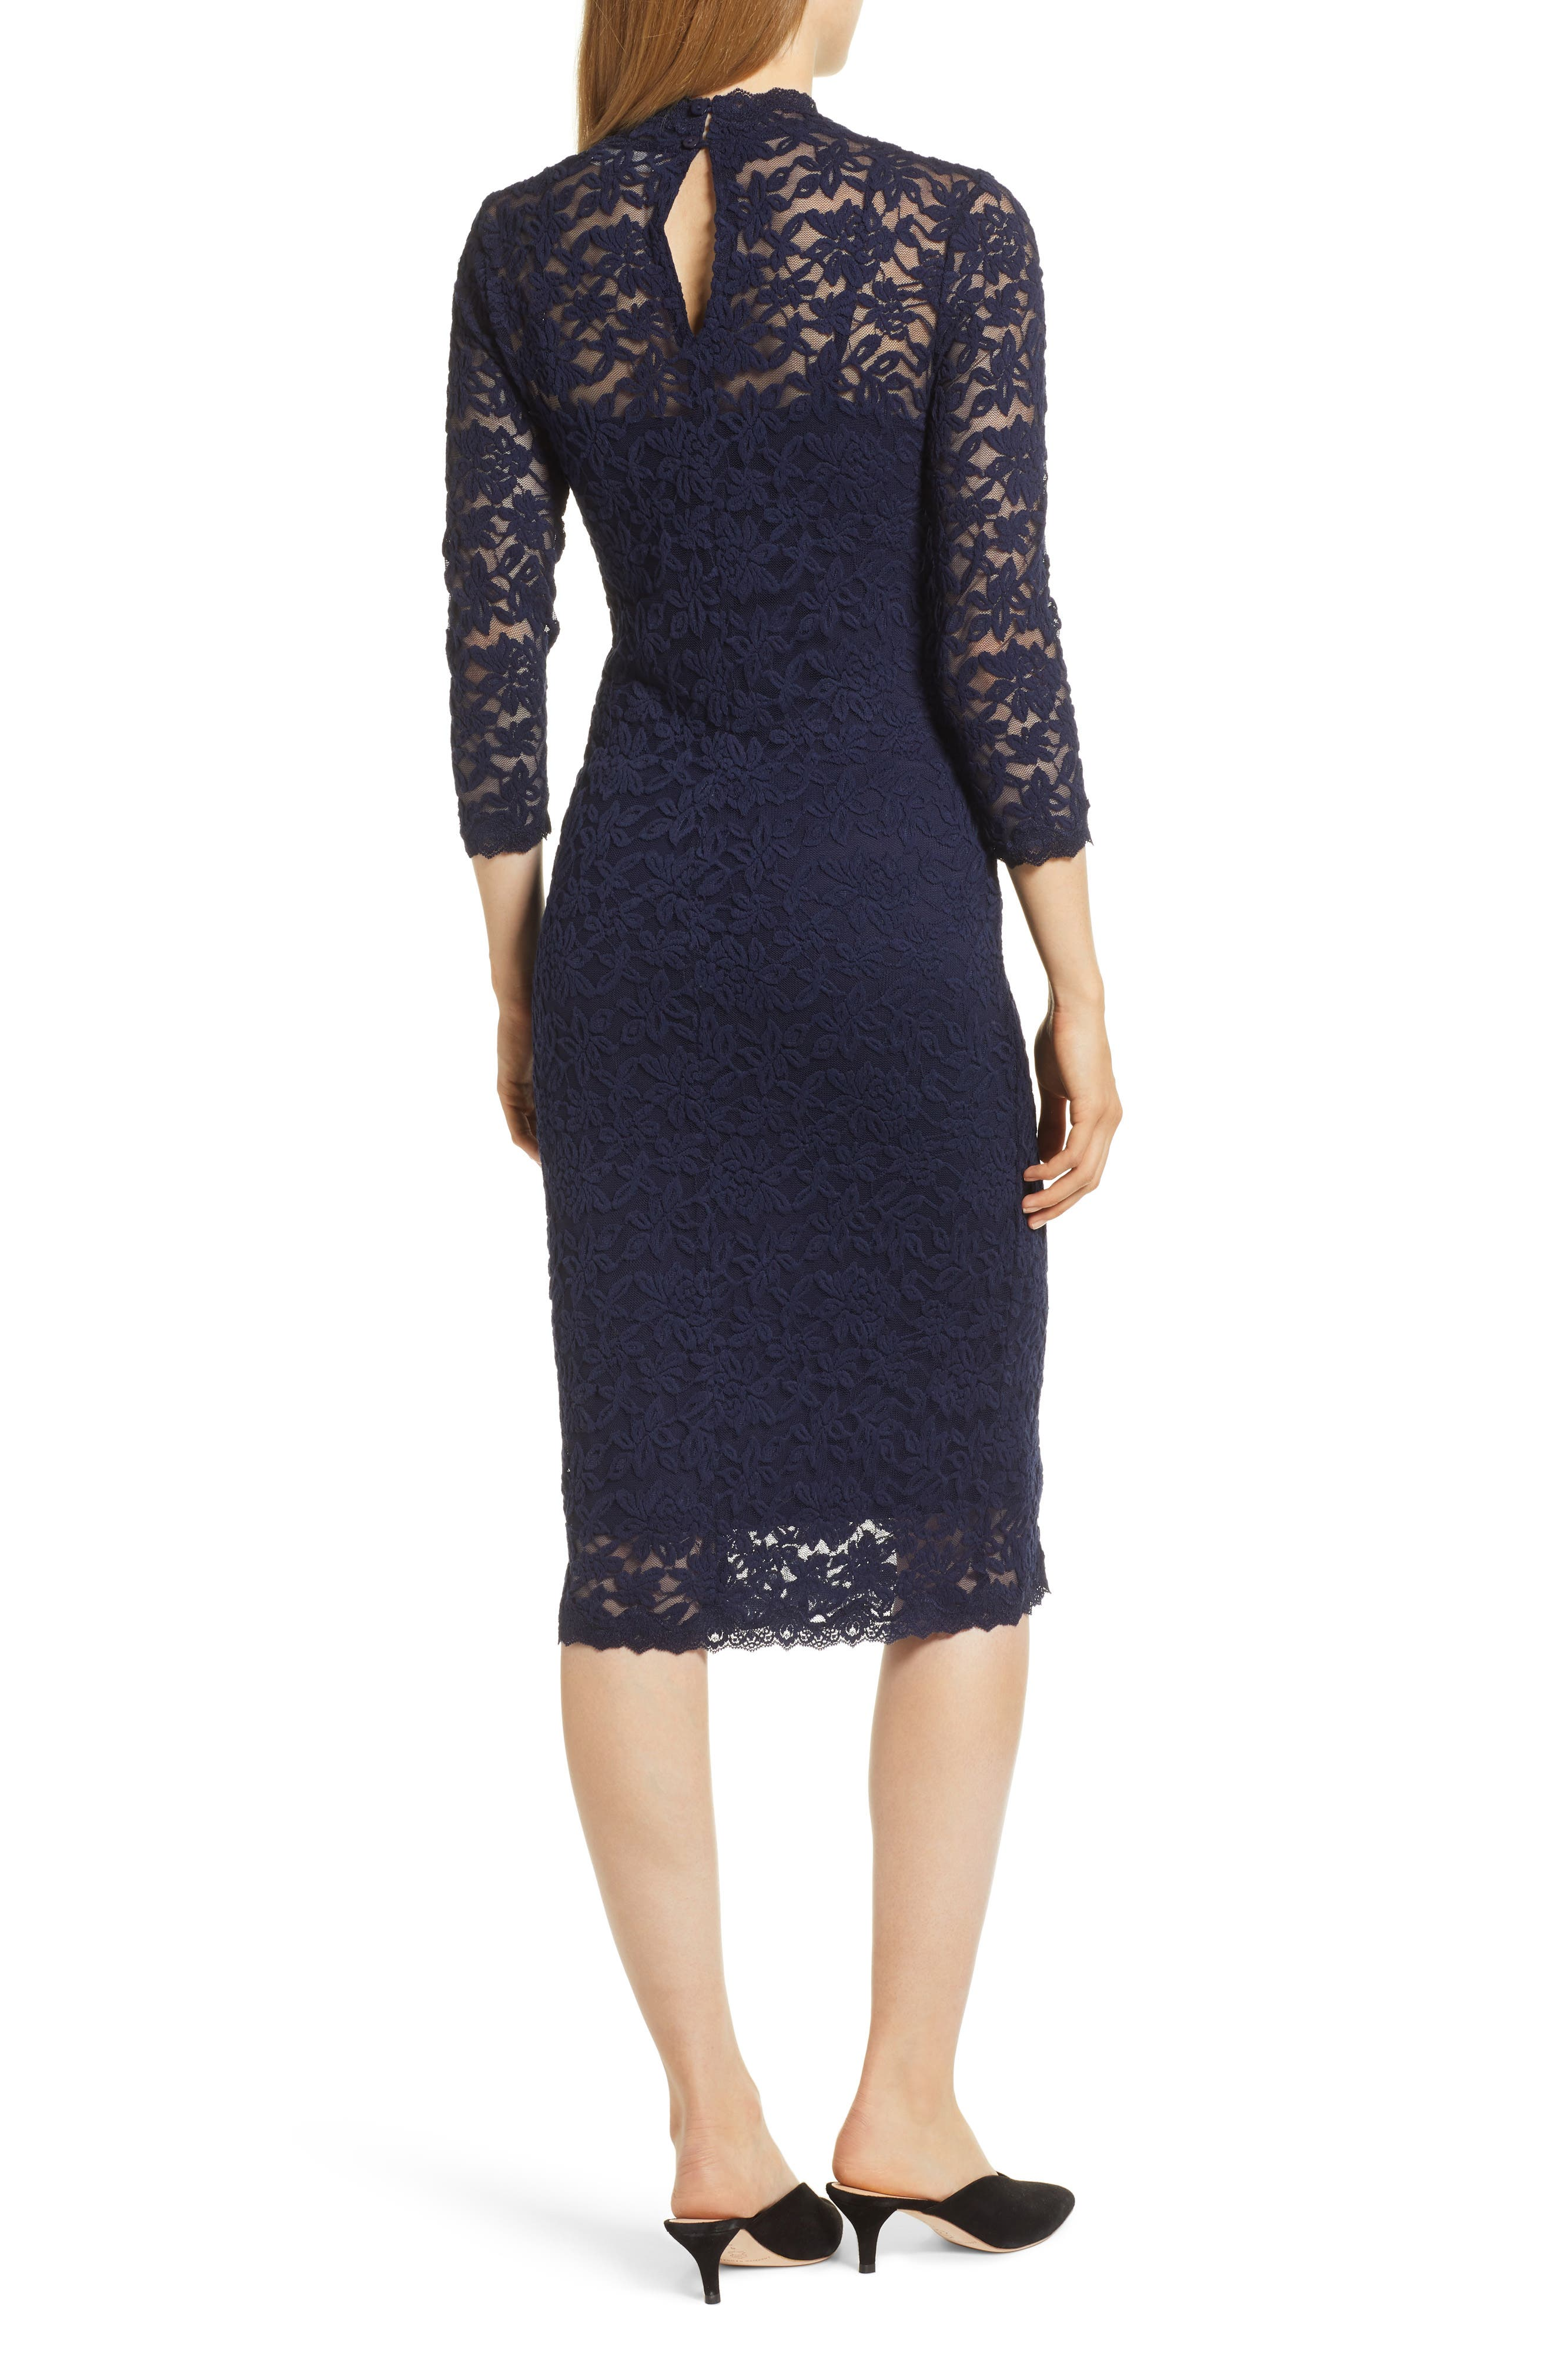 ROSEMUNDE, Delicia Lace Body-Con Dress, Alternate thumbnail 2, color, MARITIME BLUE